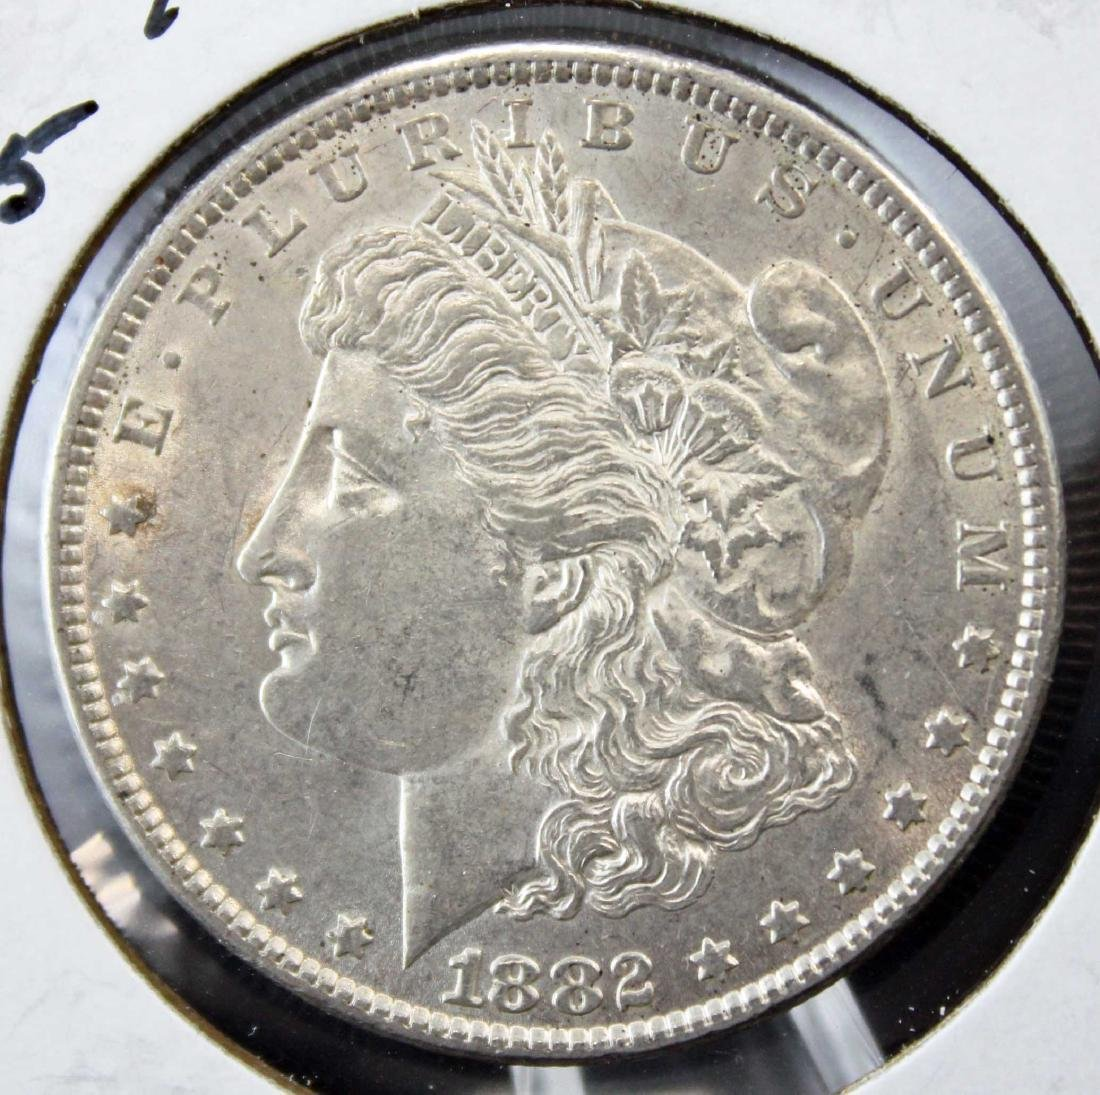 2 Morgan Silver Dollars w/ Errors 1882 P & 1884 O - 2